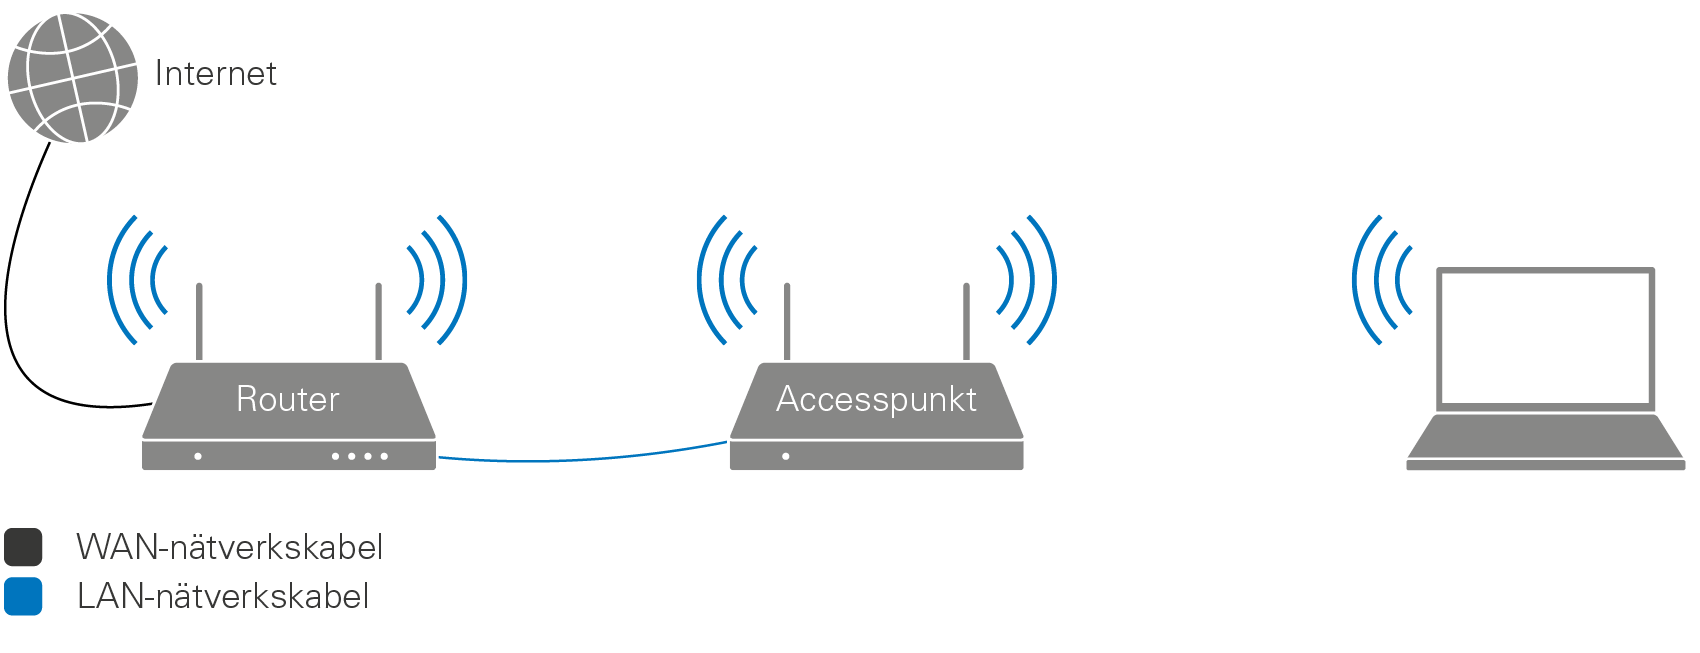 accesspunkt eller repeater